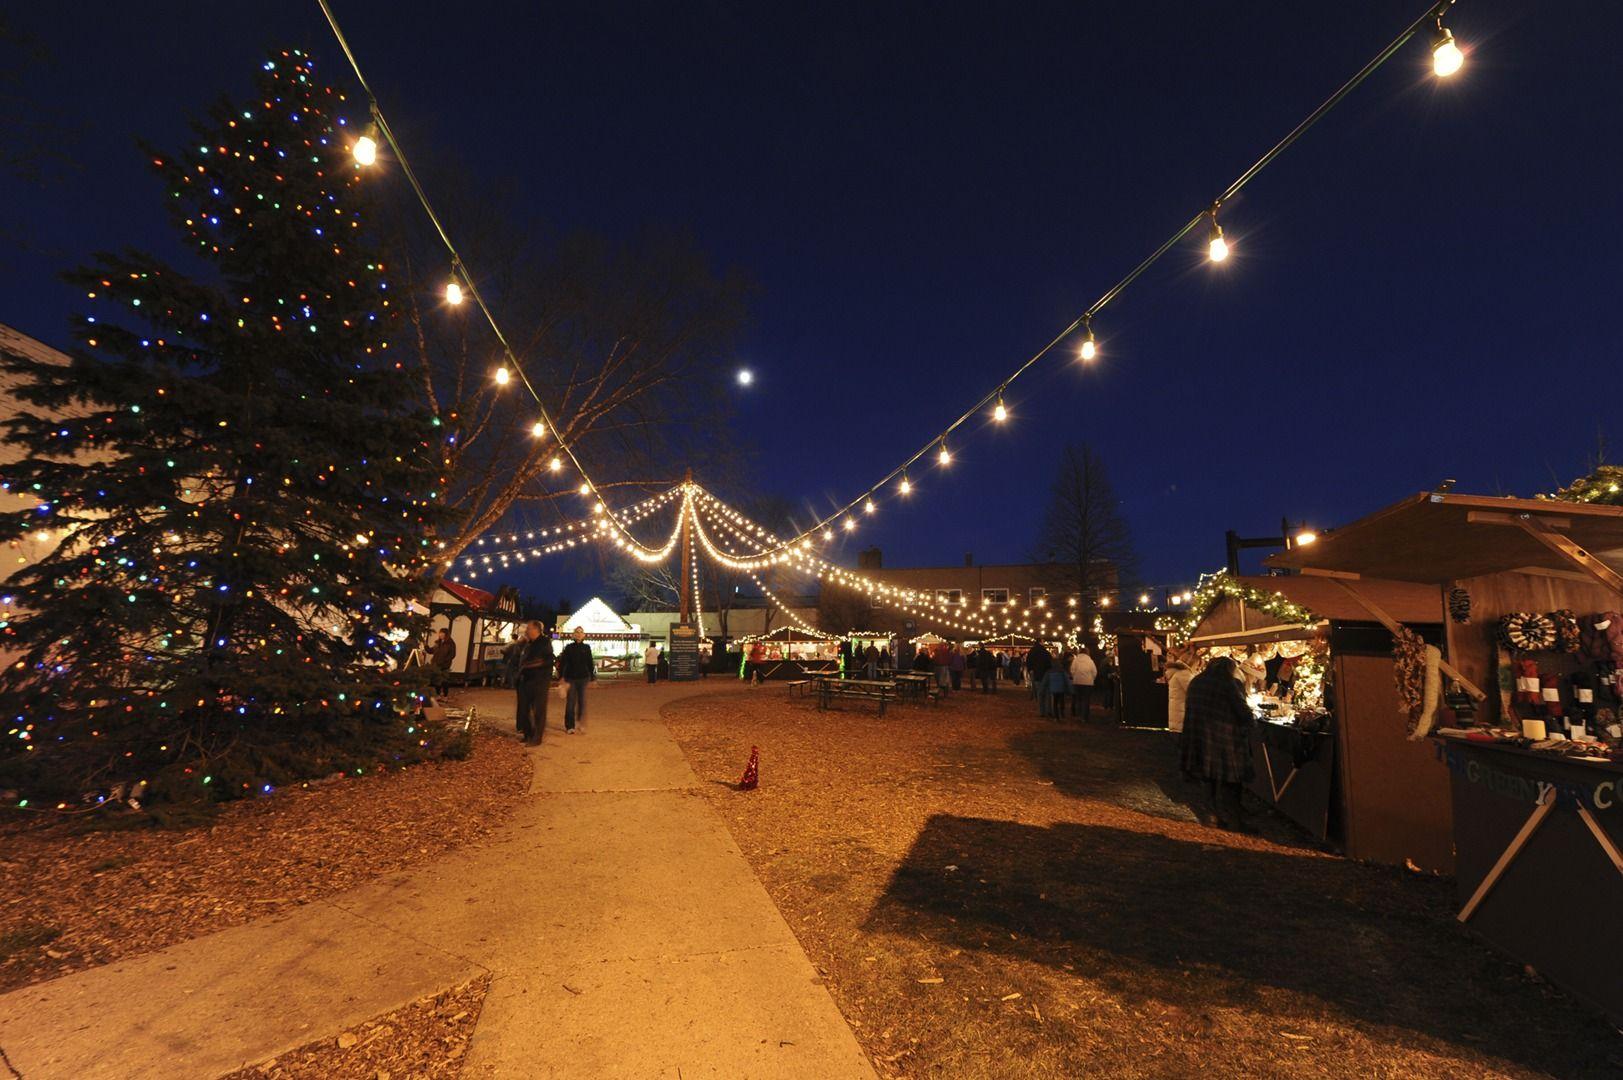 the german christmas market of oconomowoc inc entertainment german cuisine polka music - Oconomowoc German Christmas Market